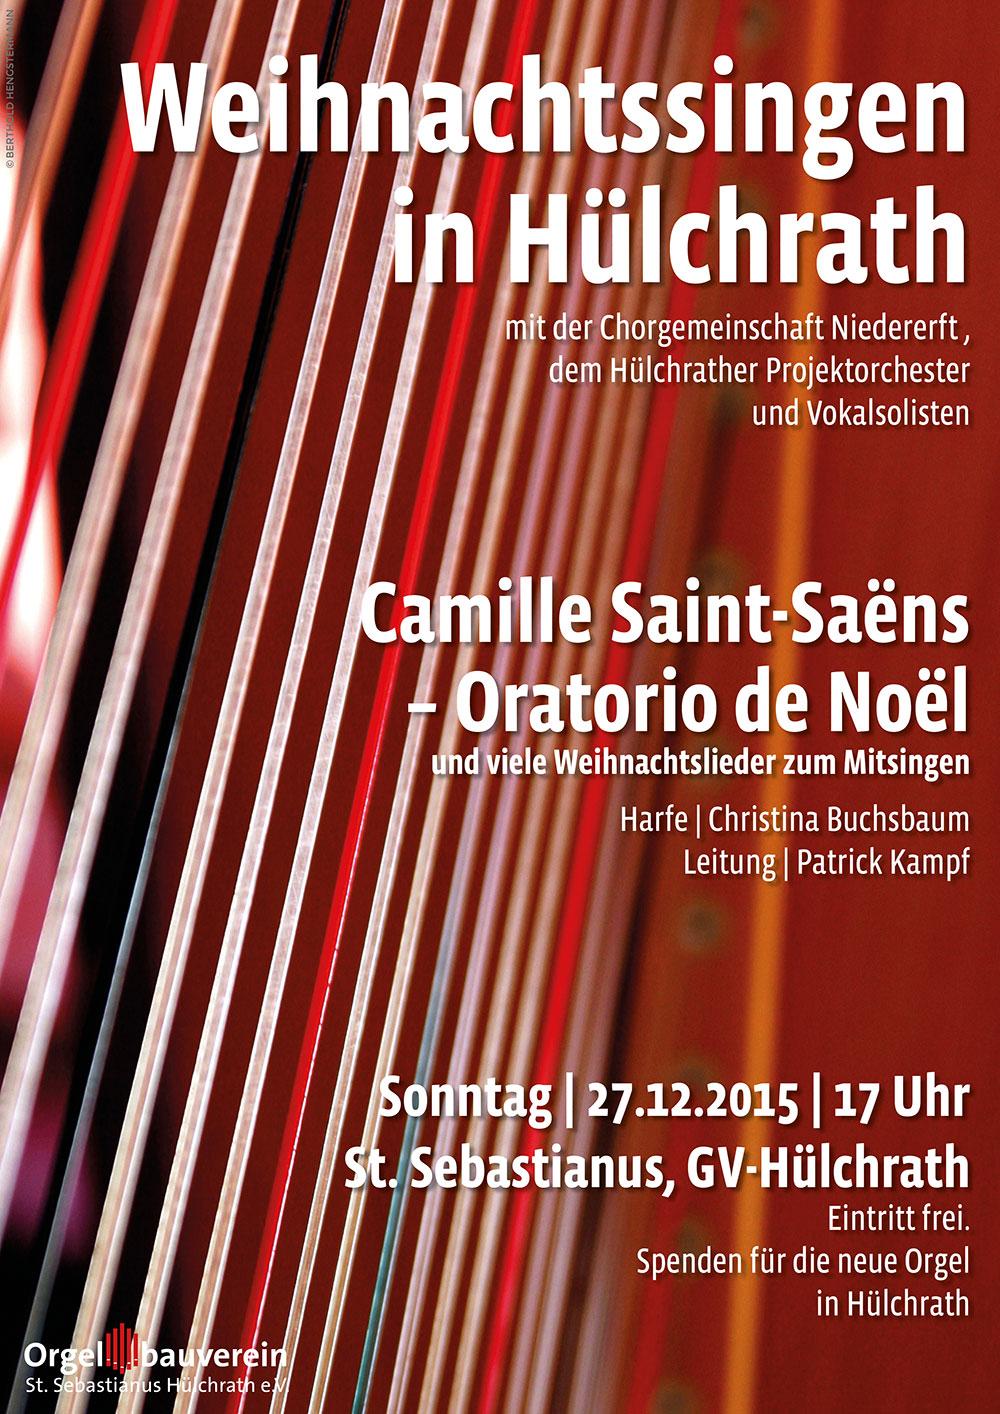 Plakat_Huelchrath_212015